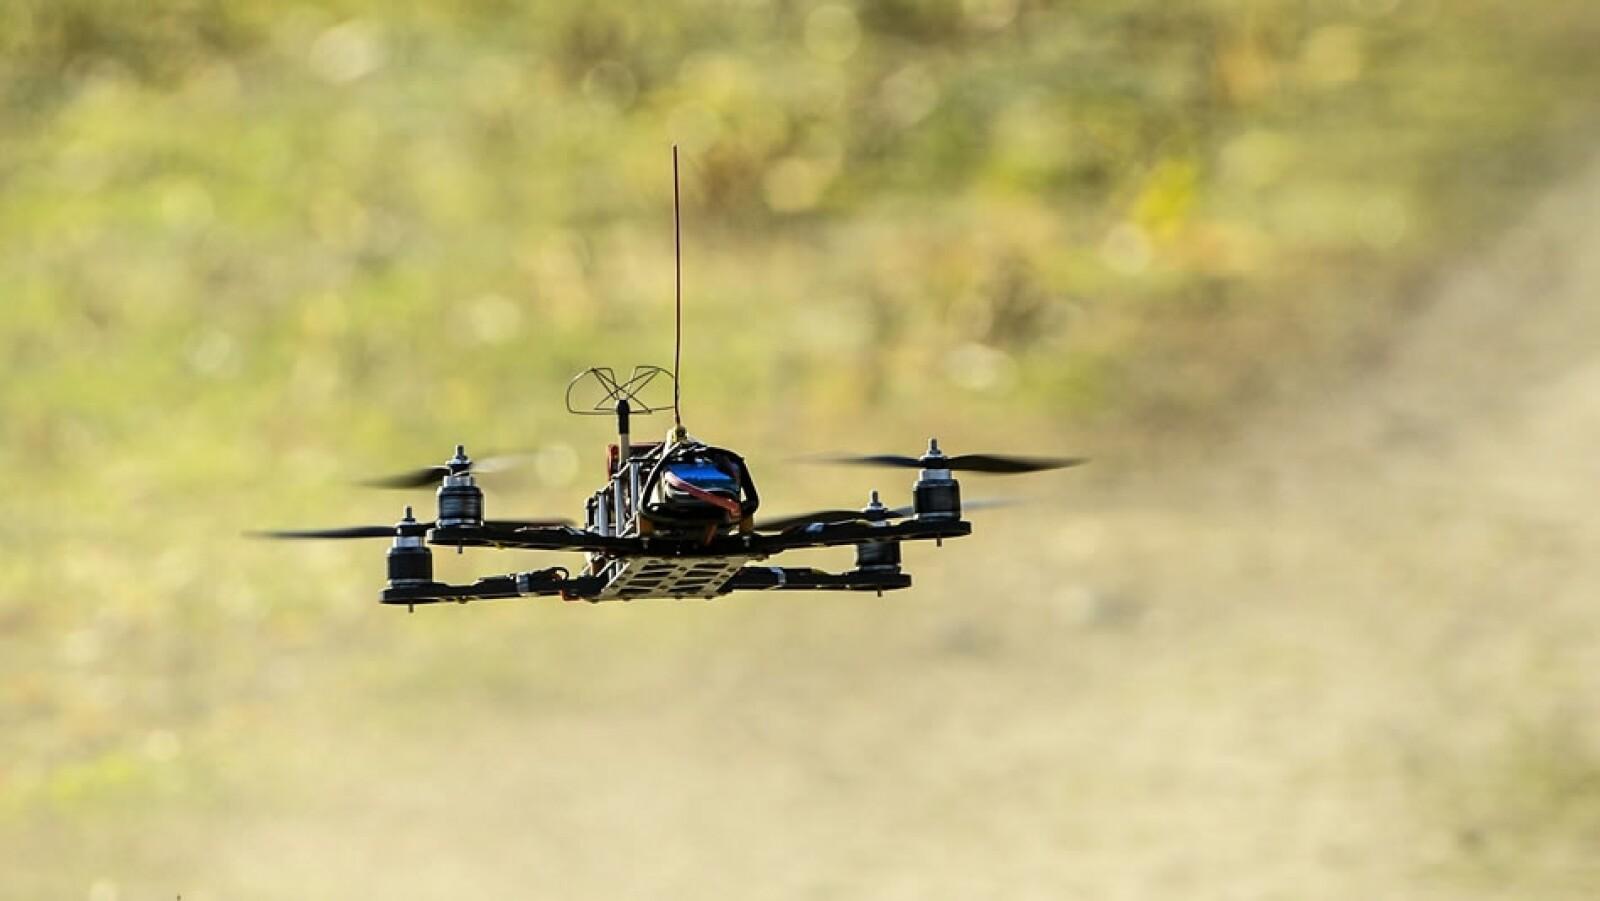 drones bosques usos